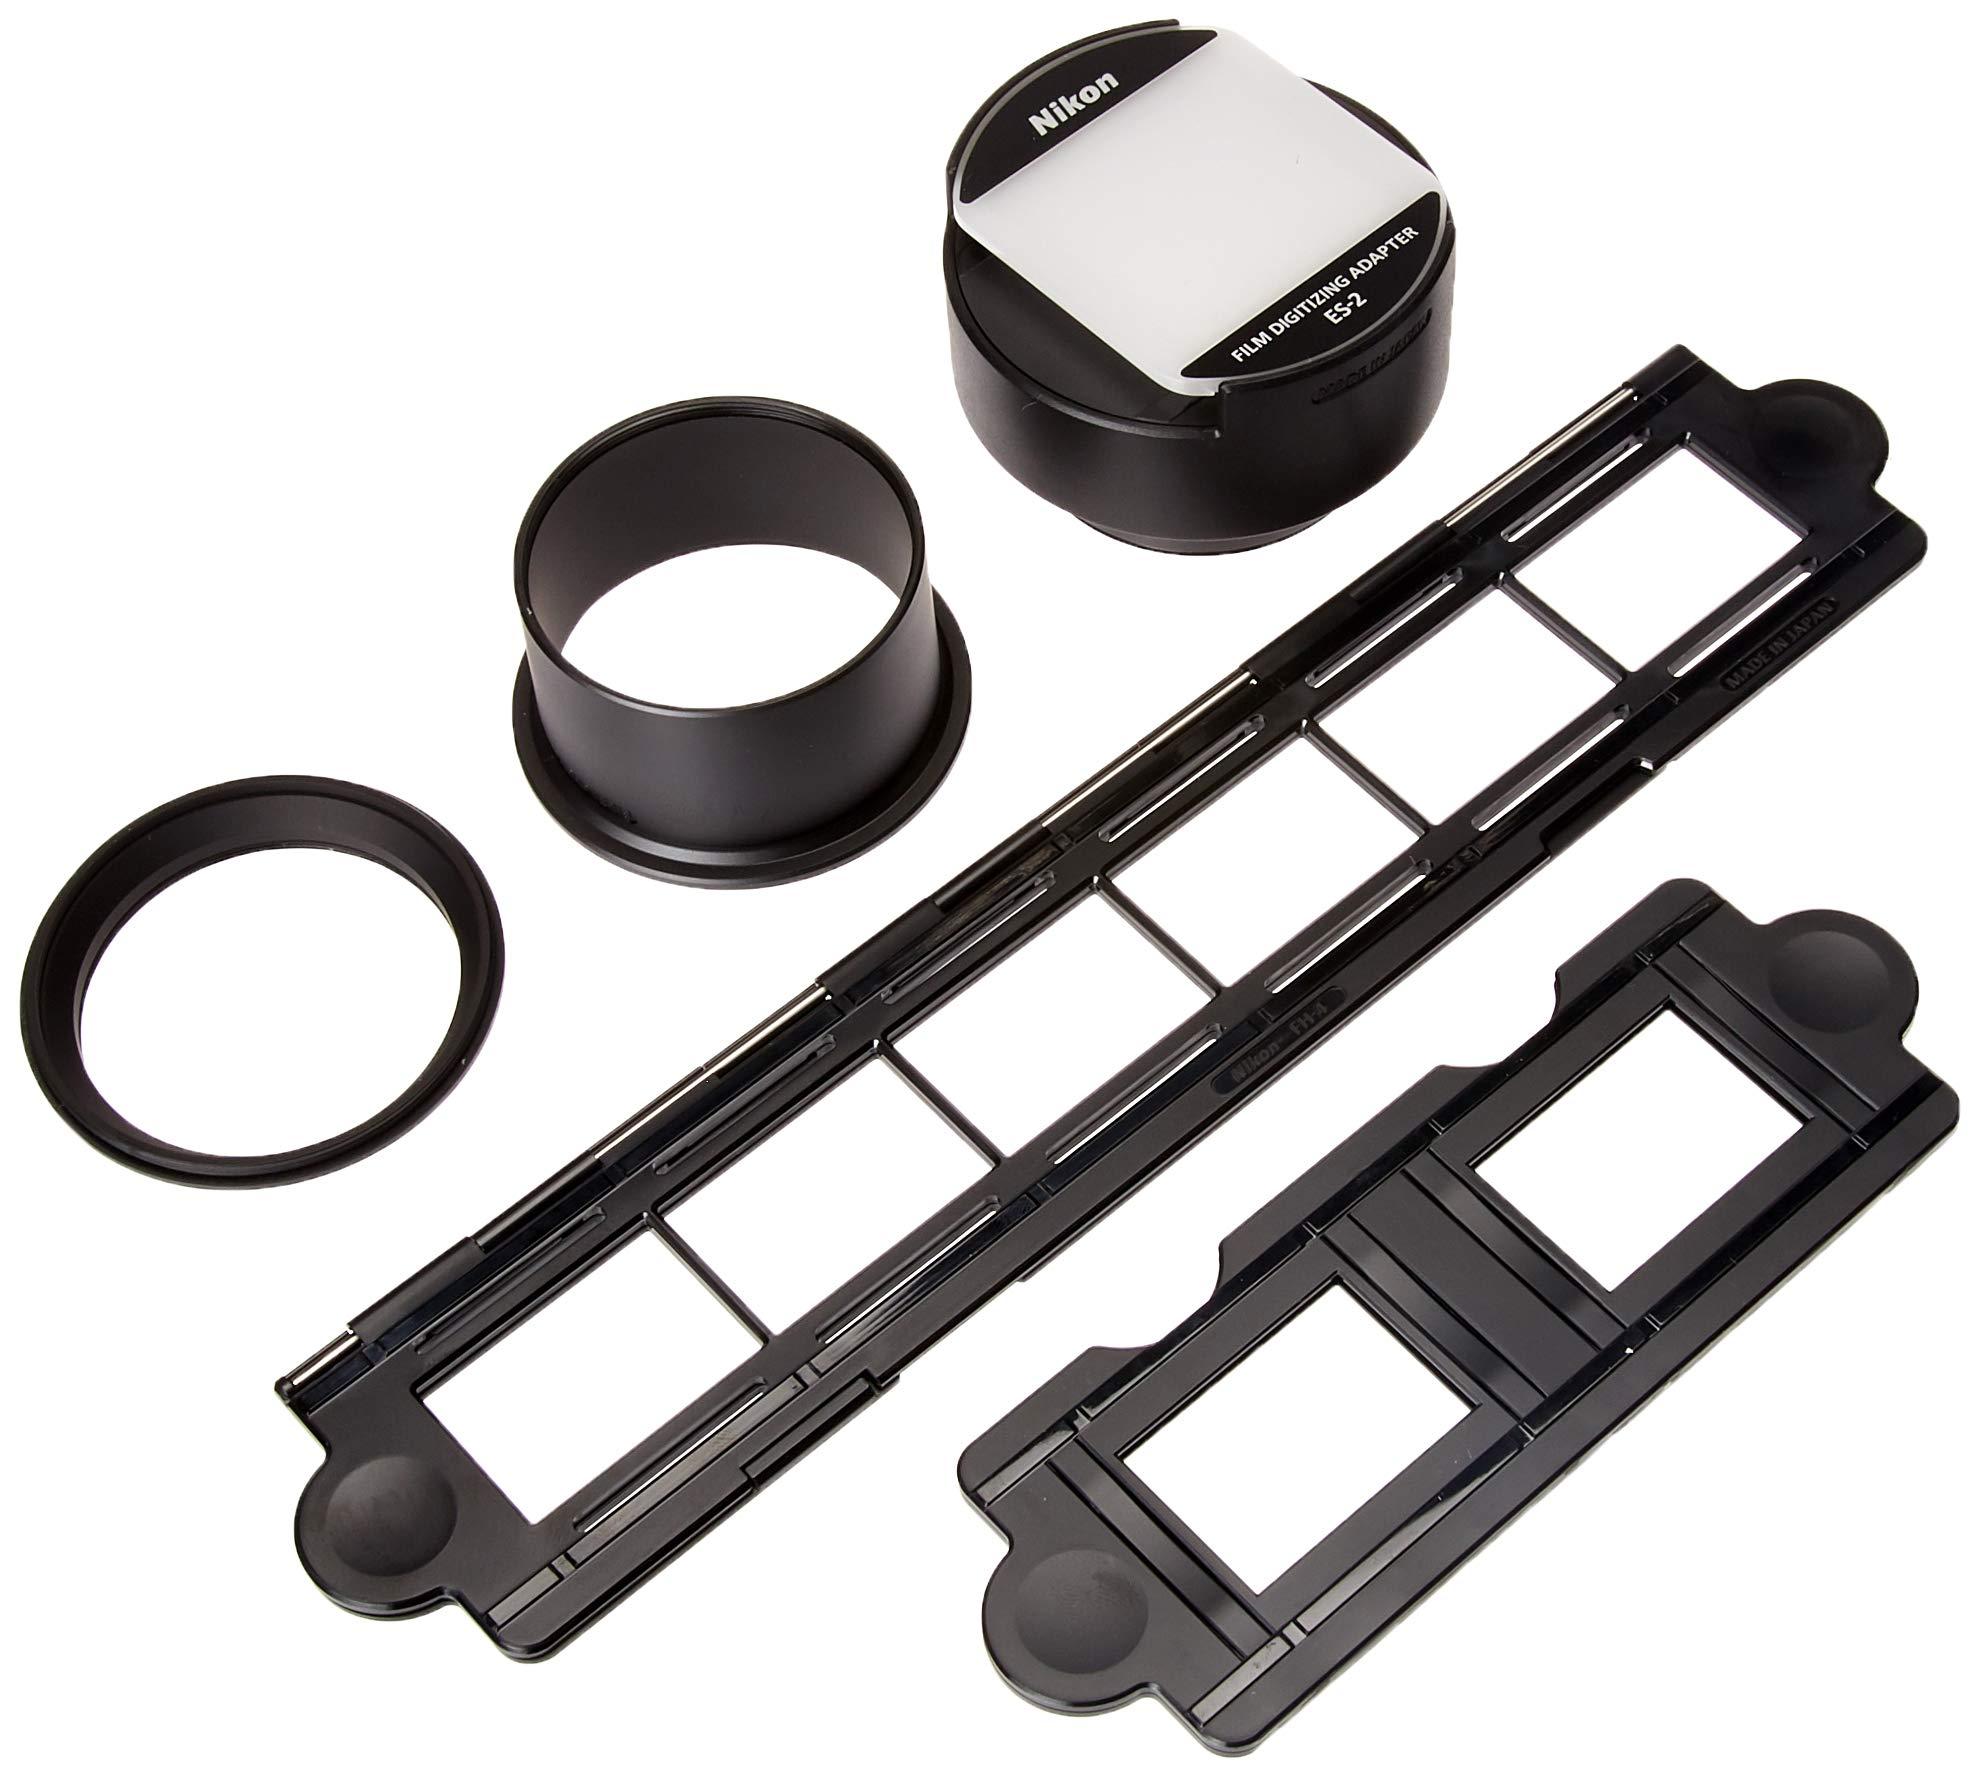 Nikon ES-2 Film Digitizing Adapter Set by Nikon